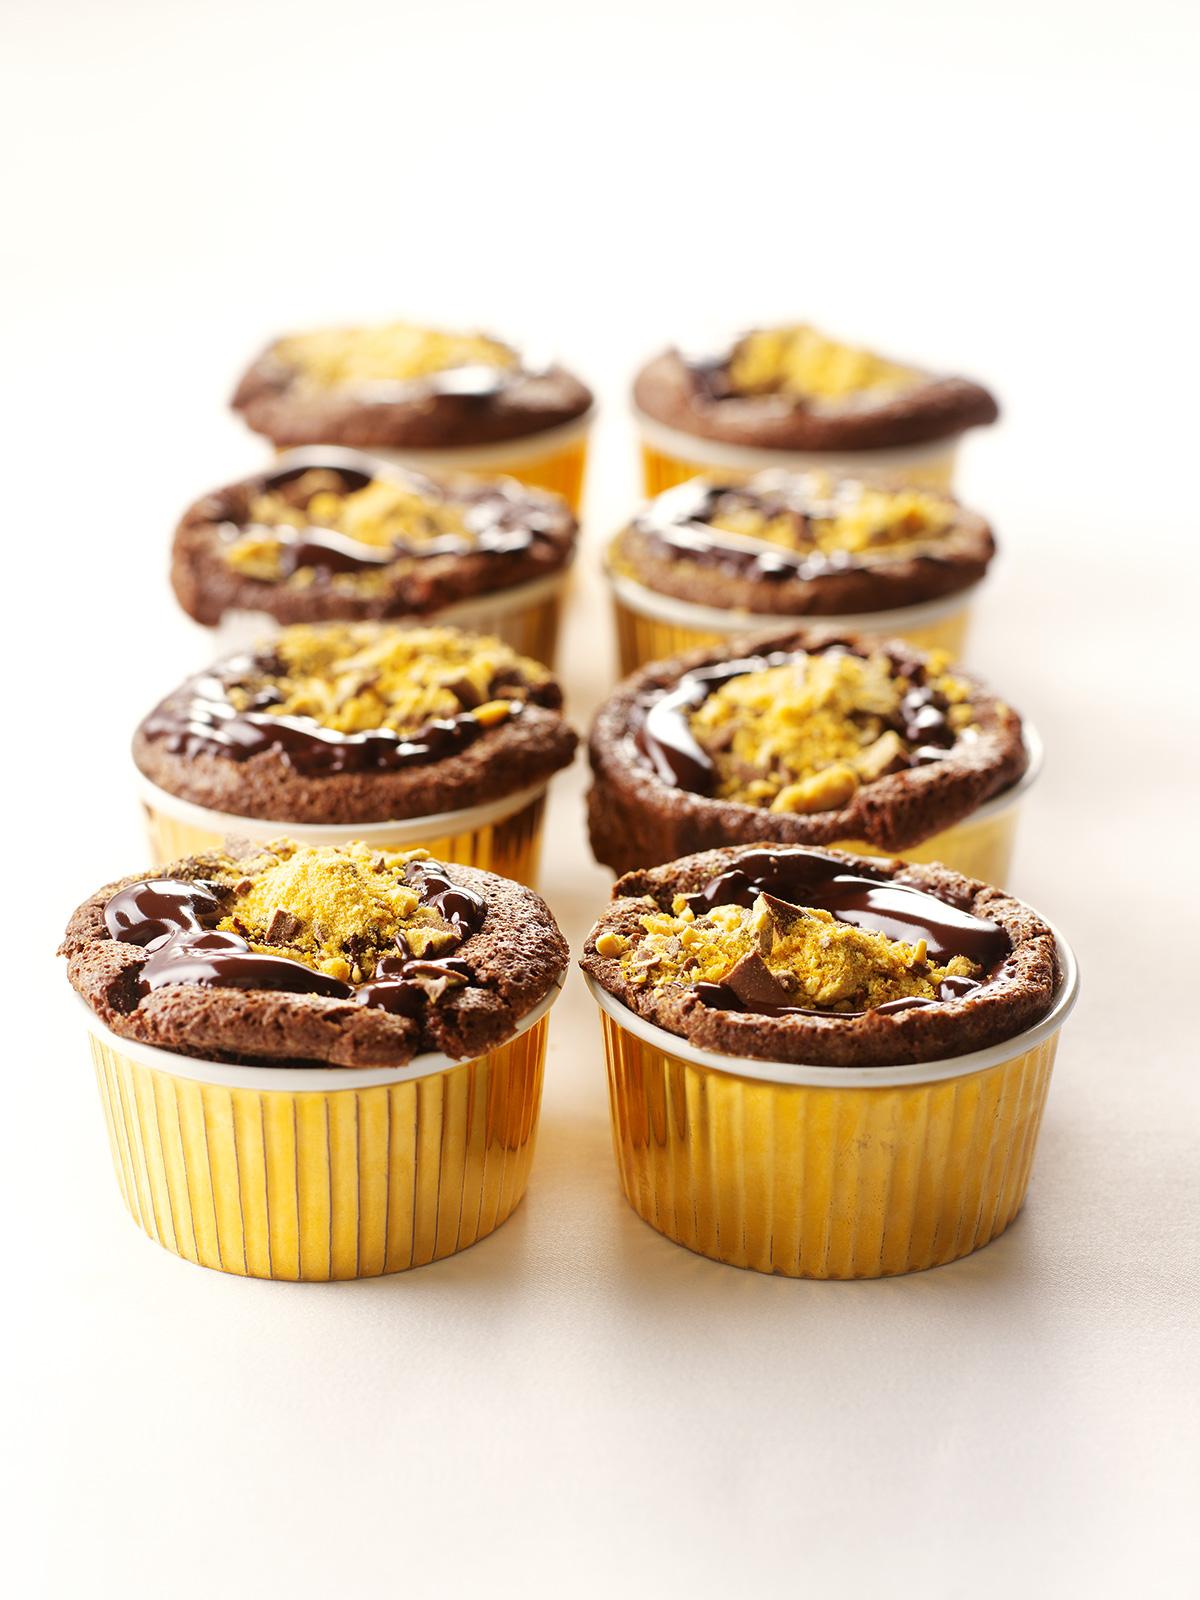 Glitzy Chocolate Puddings